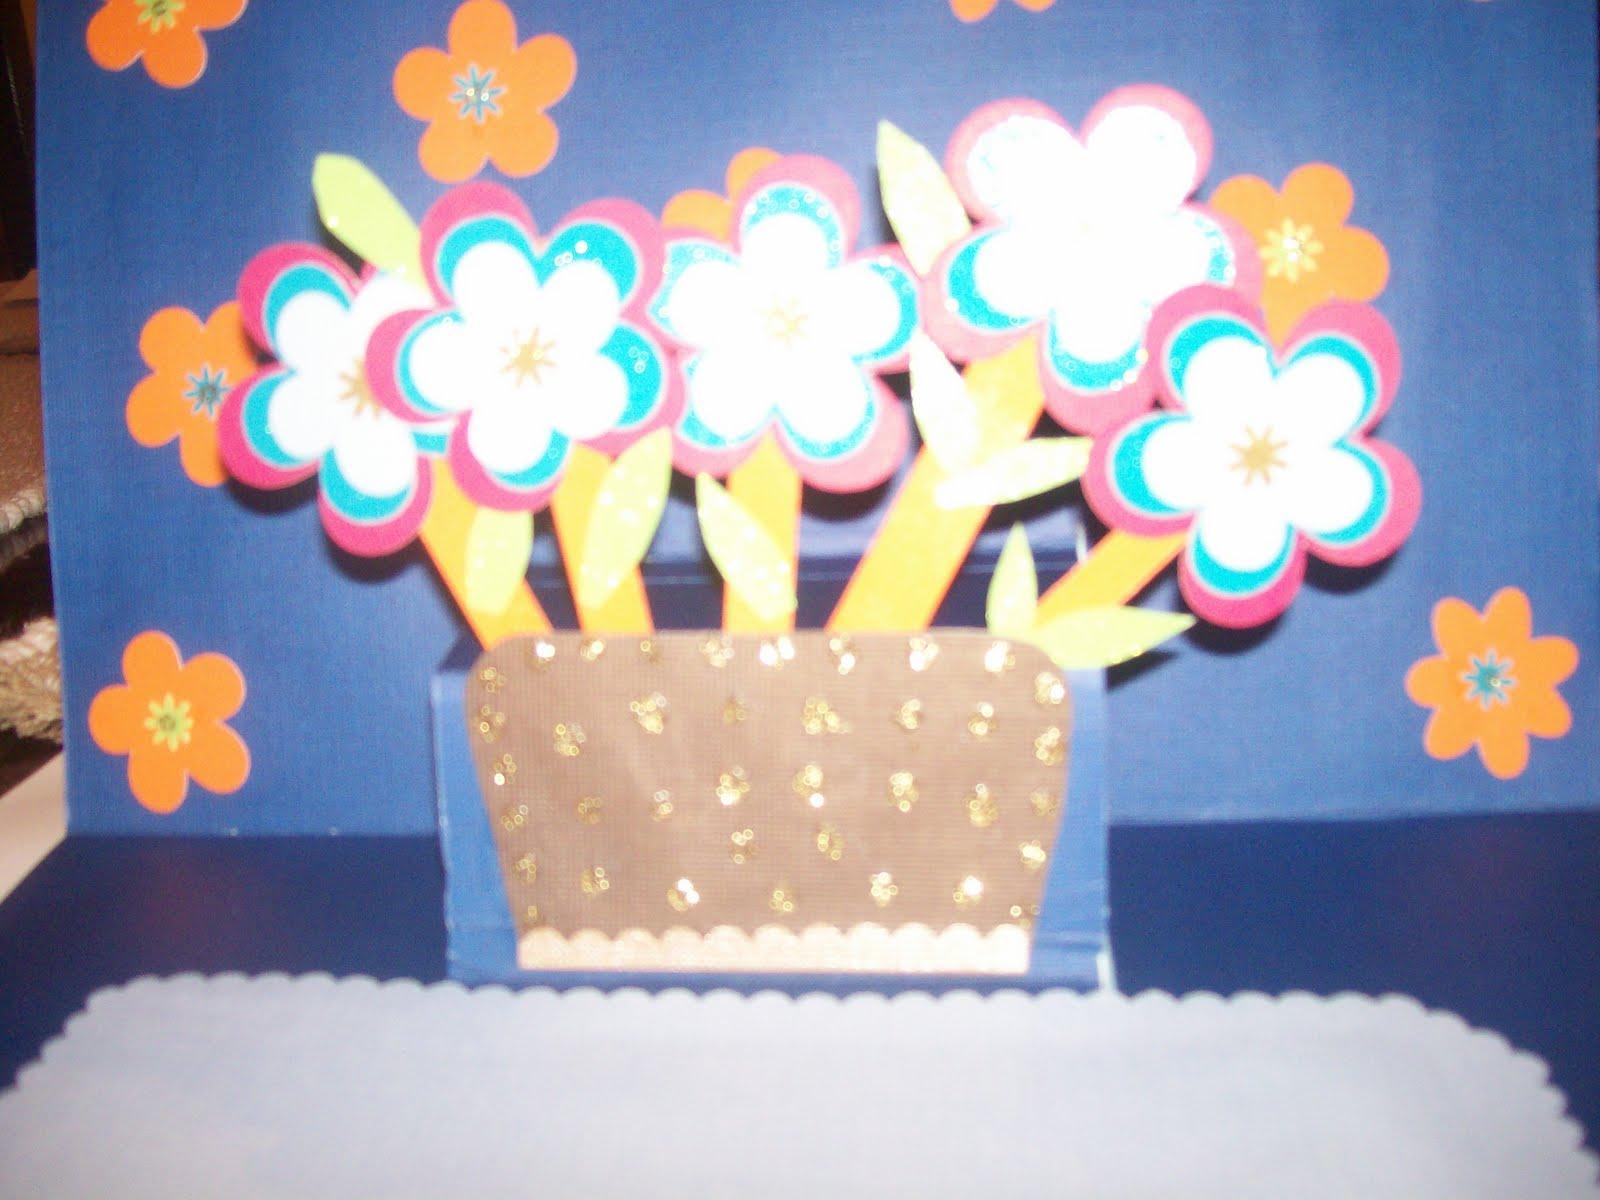 Ayesha Handmade Greeting Cards Birthday card